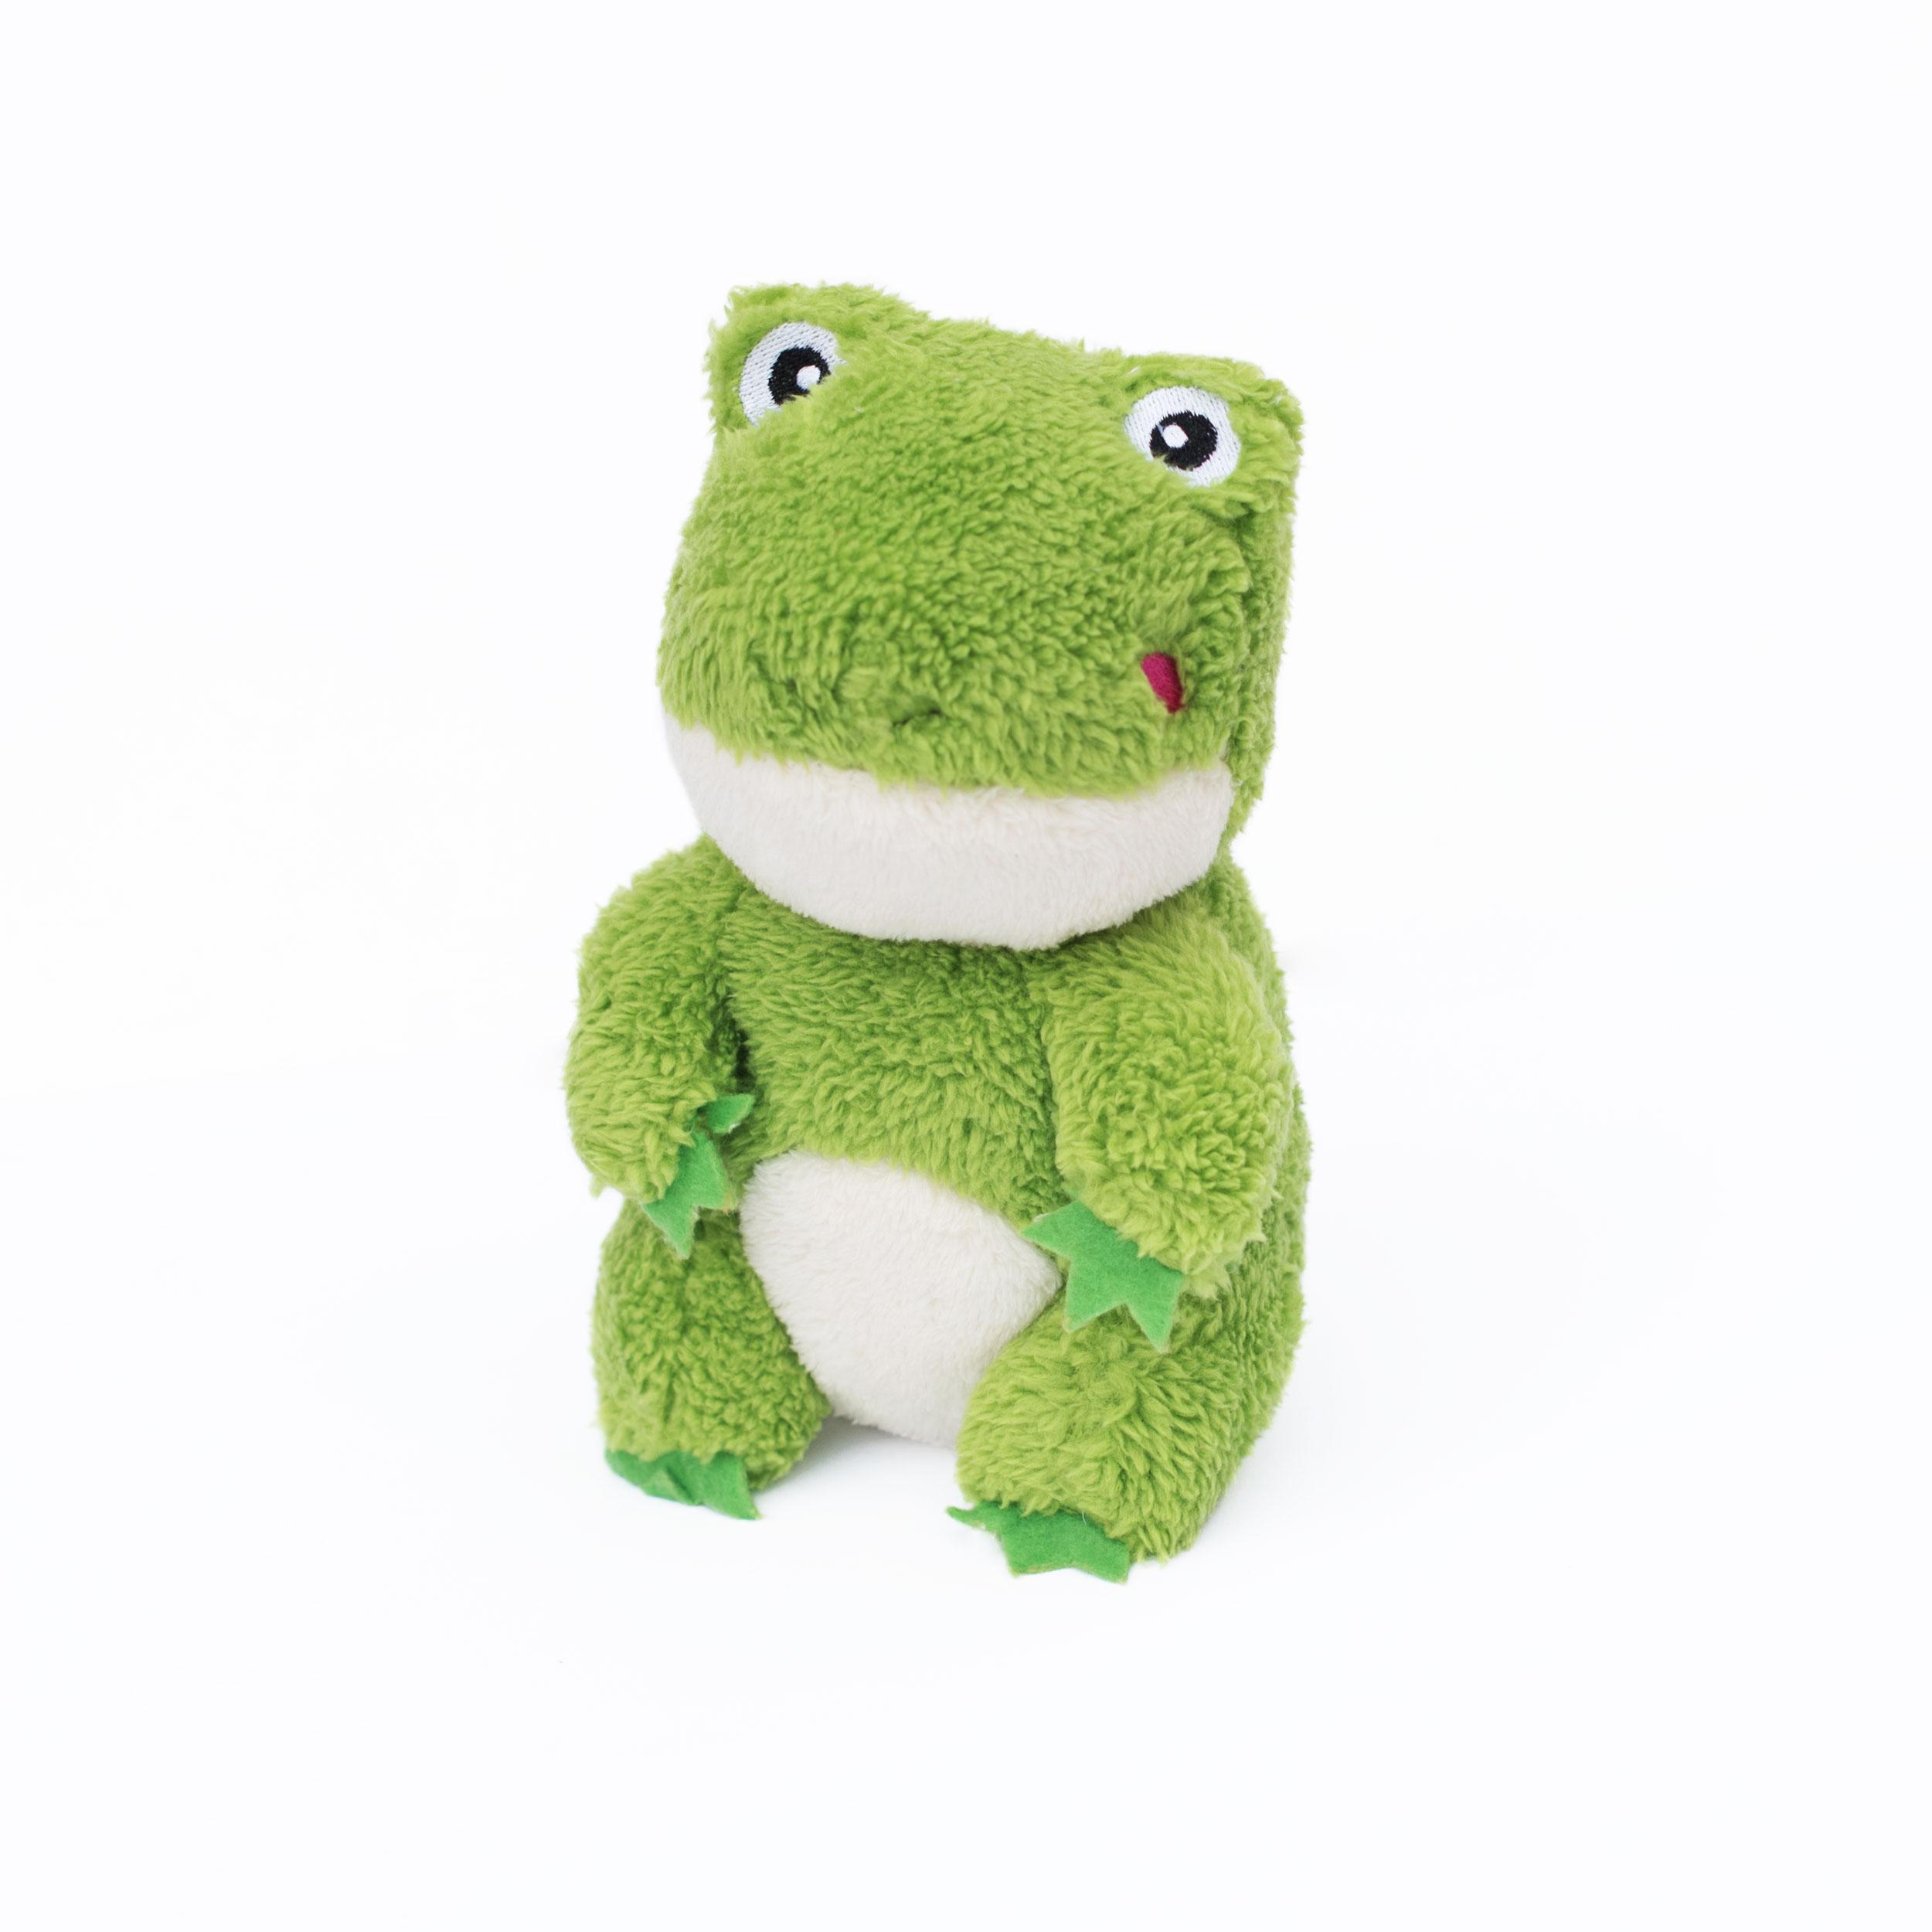 Cheeky Chumz - Frog-0